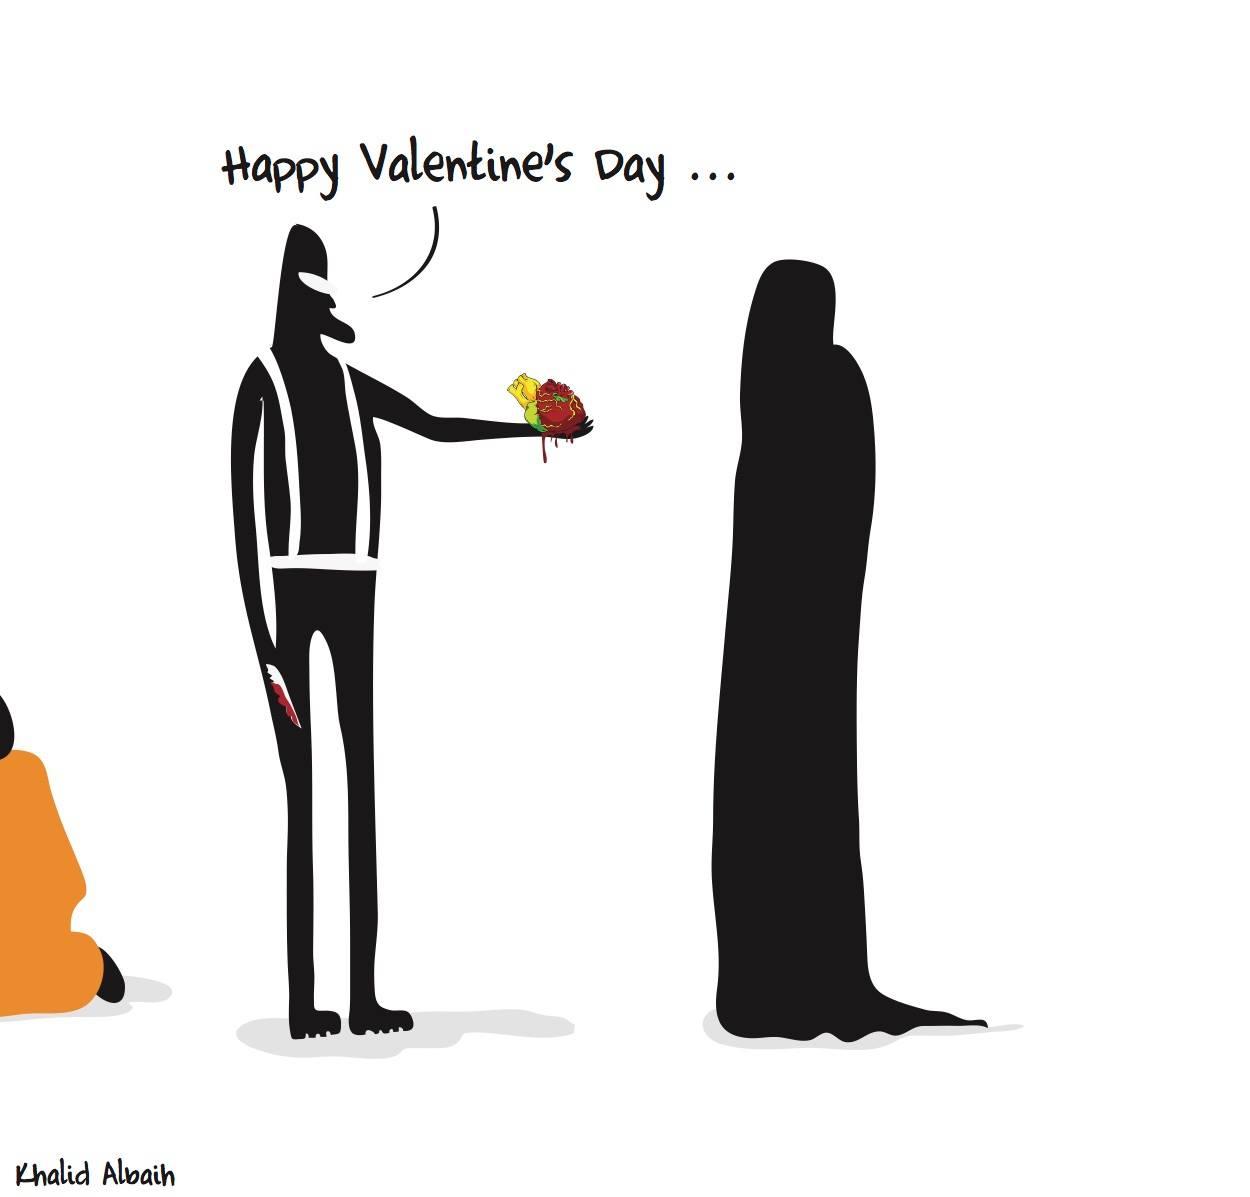 khartoon_valentines-day